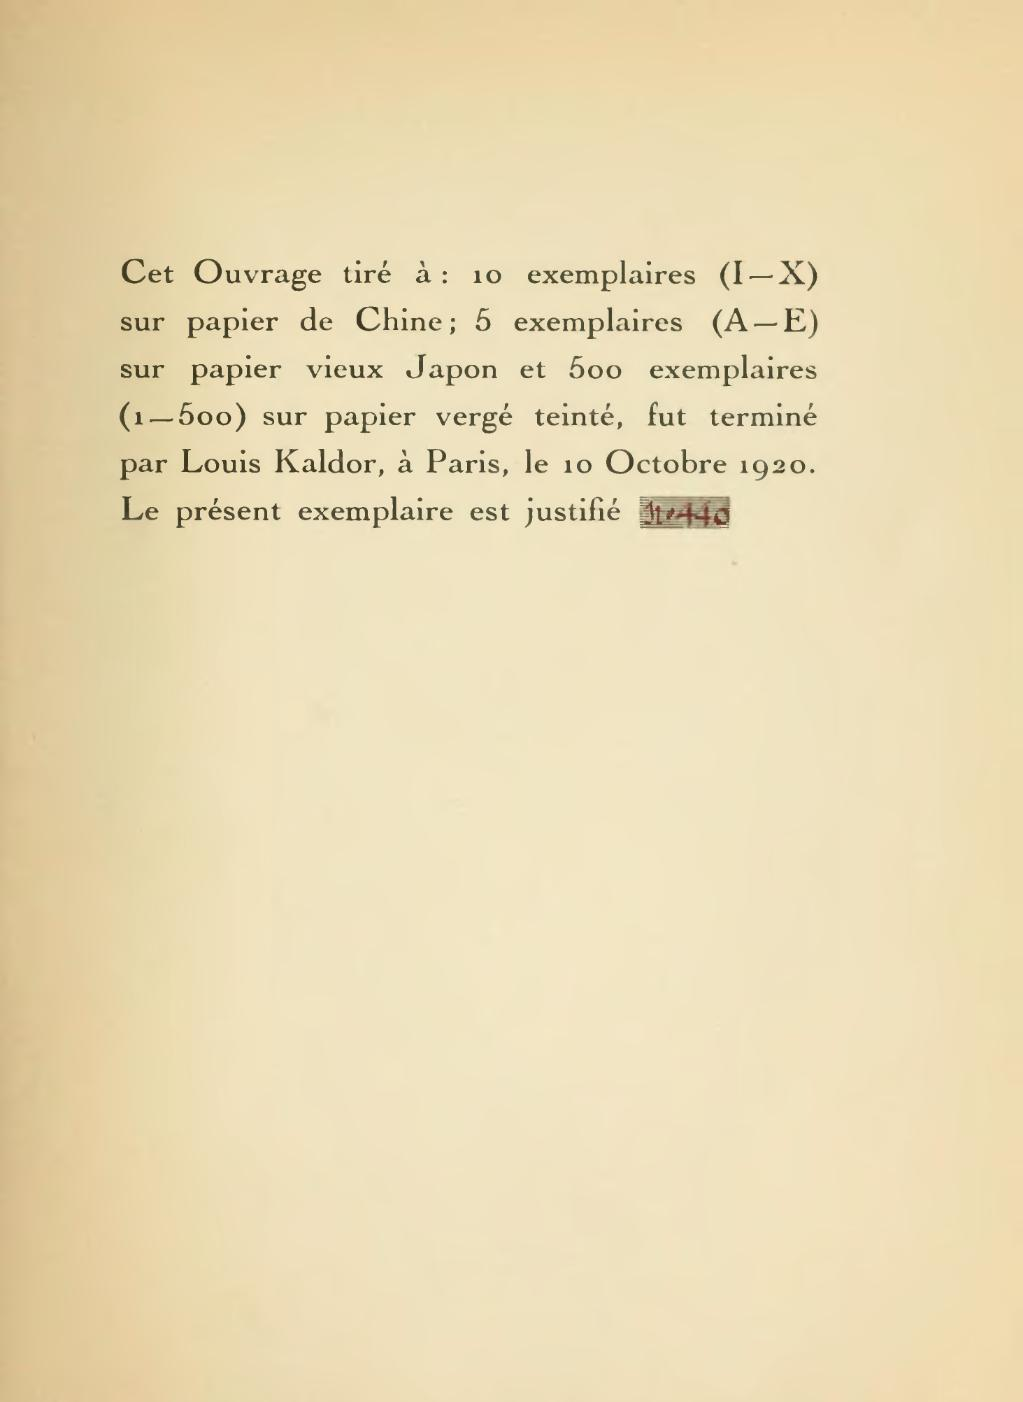 Artiste, écrivain, Poète, Scénariste (1900 - 1977).